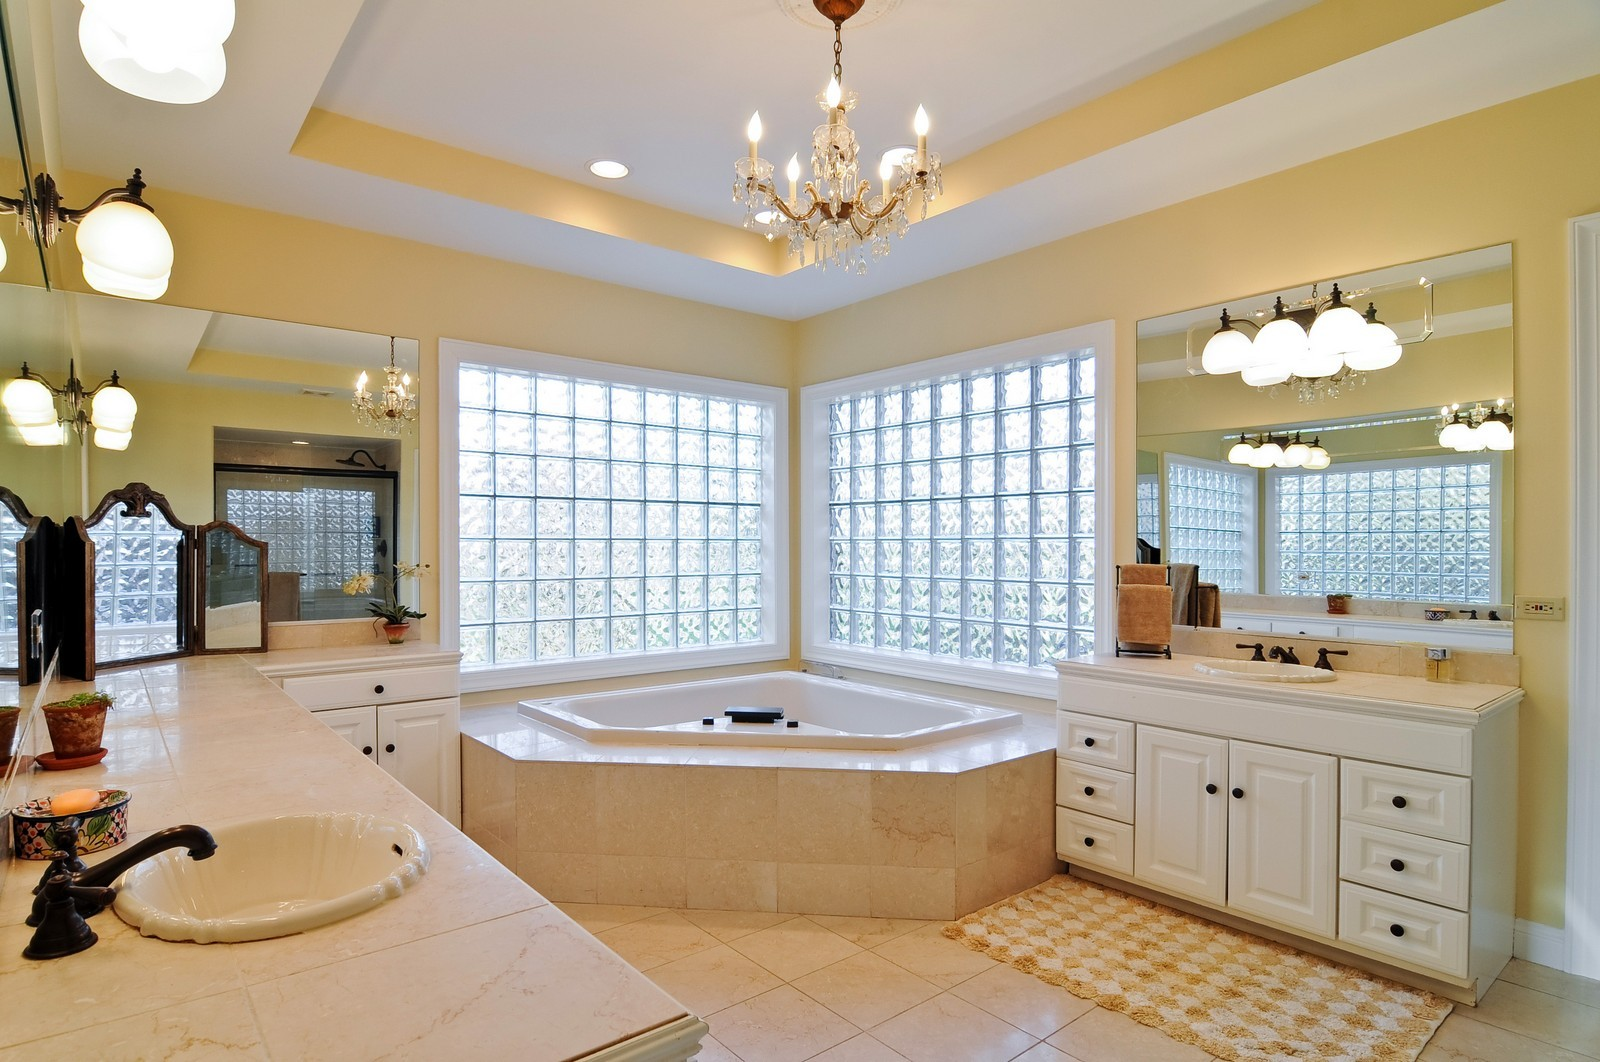 Real Estate Photography - 2091 Trenton, Libertyville, IL, 60048 - Master Bathroom